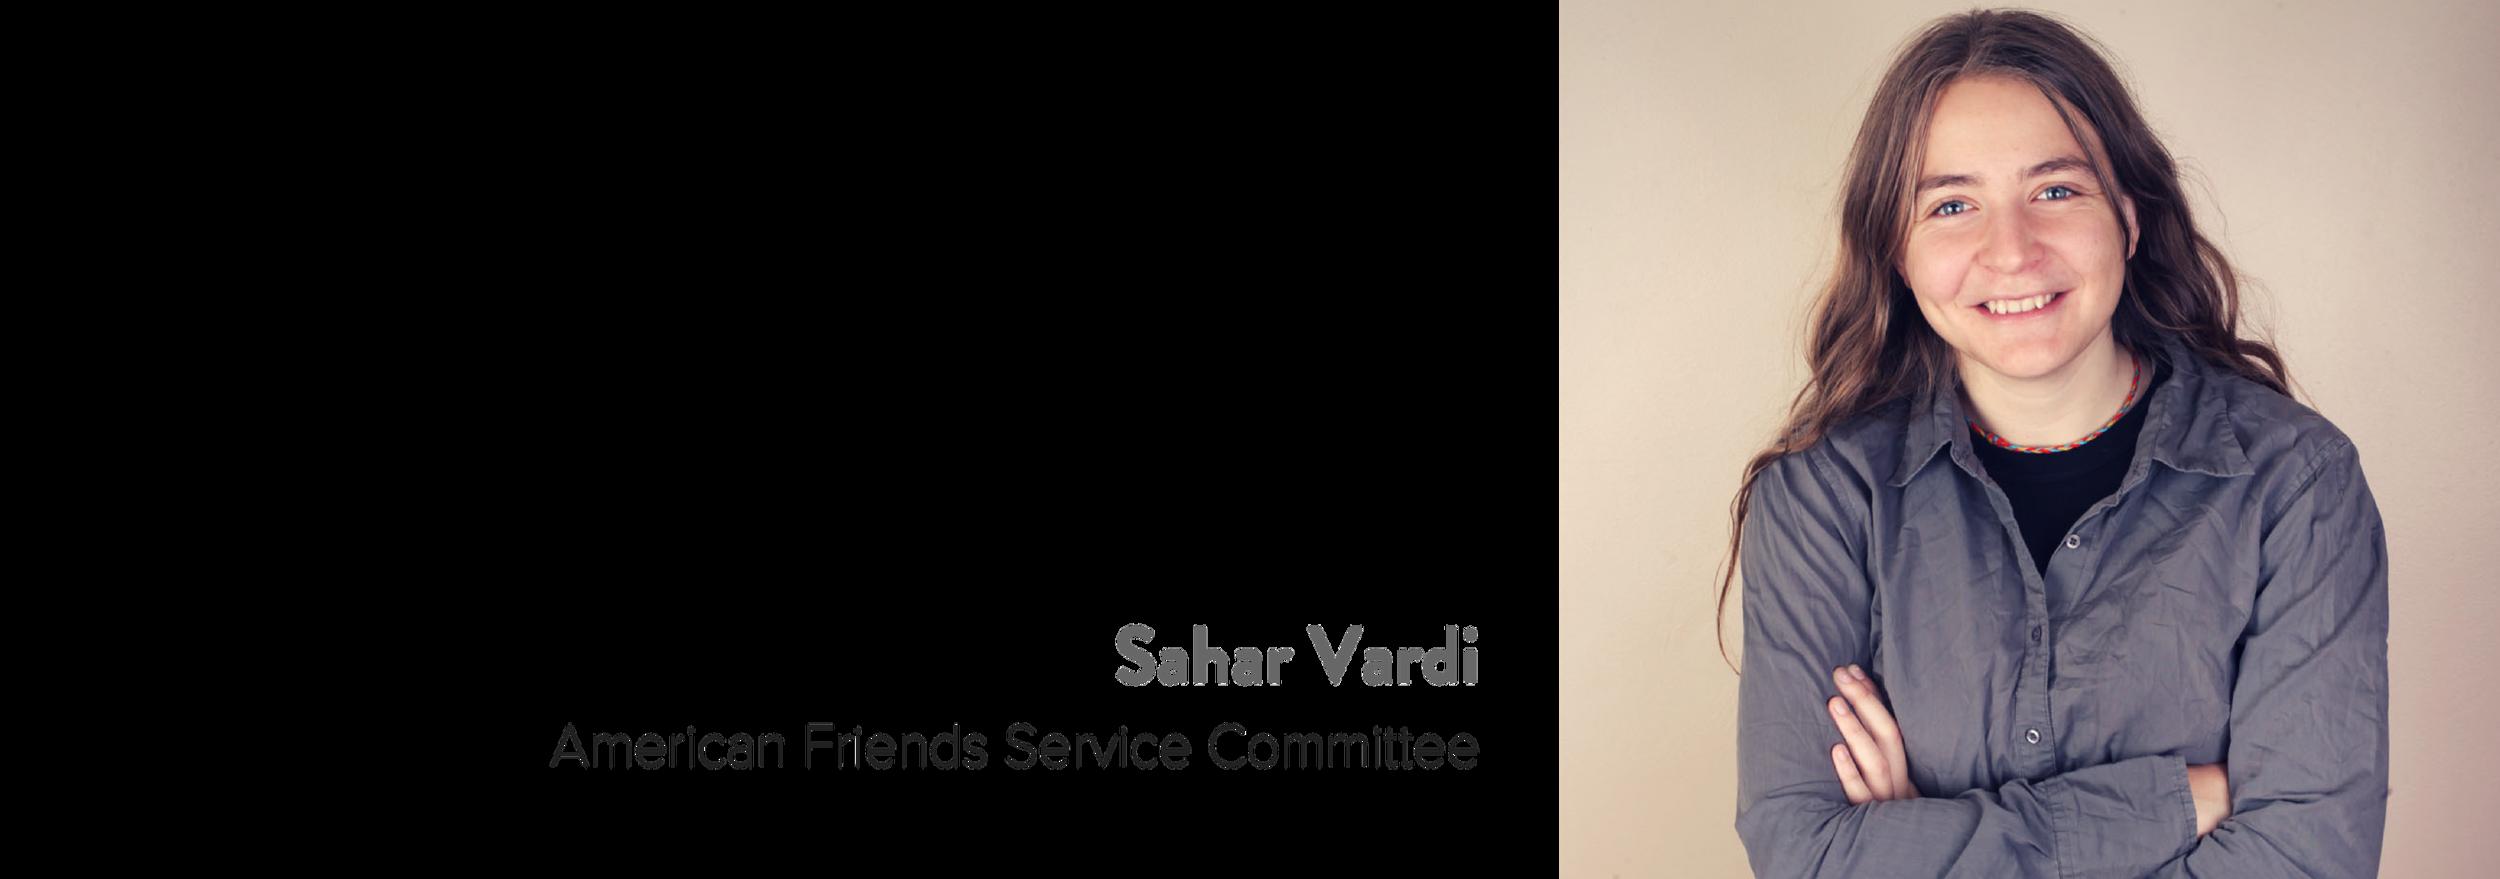 Sahar Vardi -Testimonial